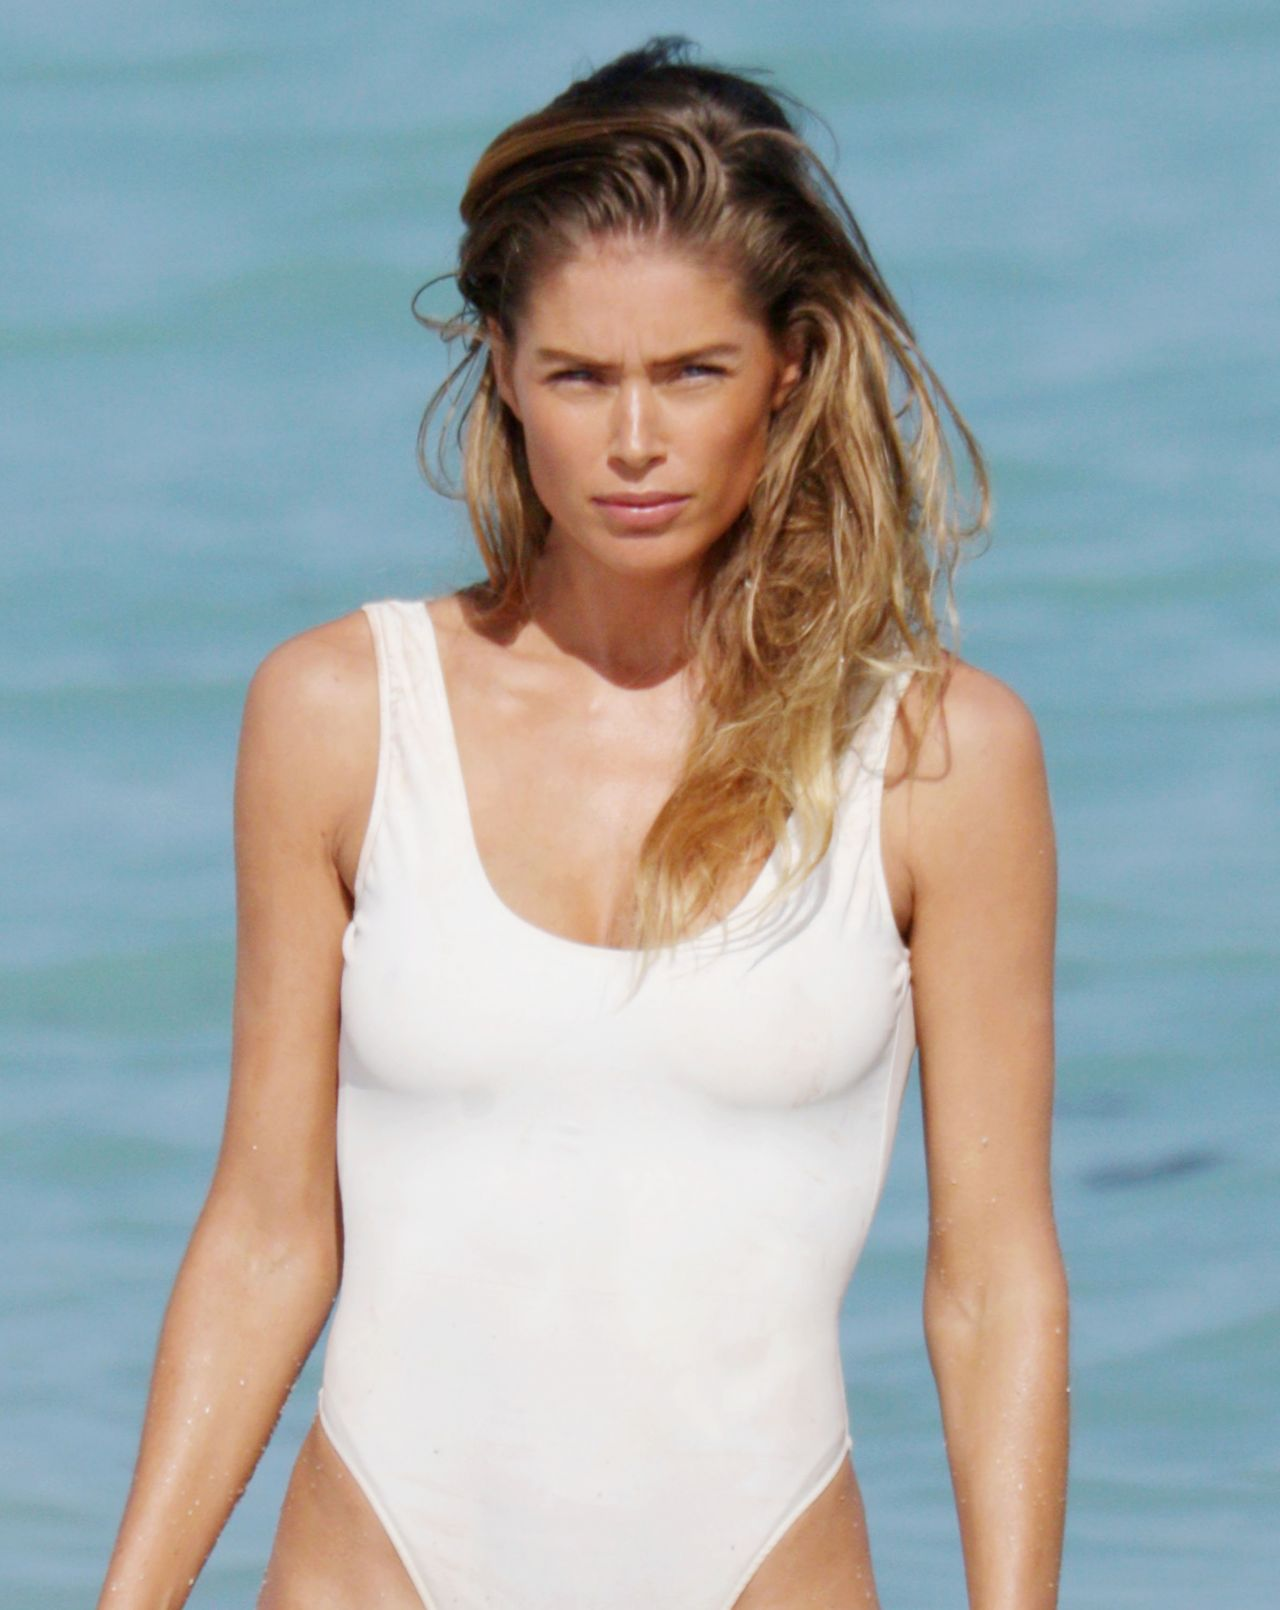 doutzen kroes shows off bikini body in miami february 2015